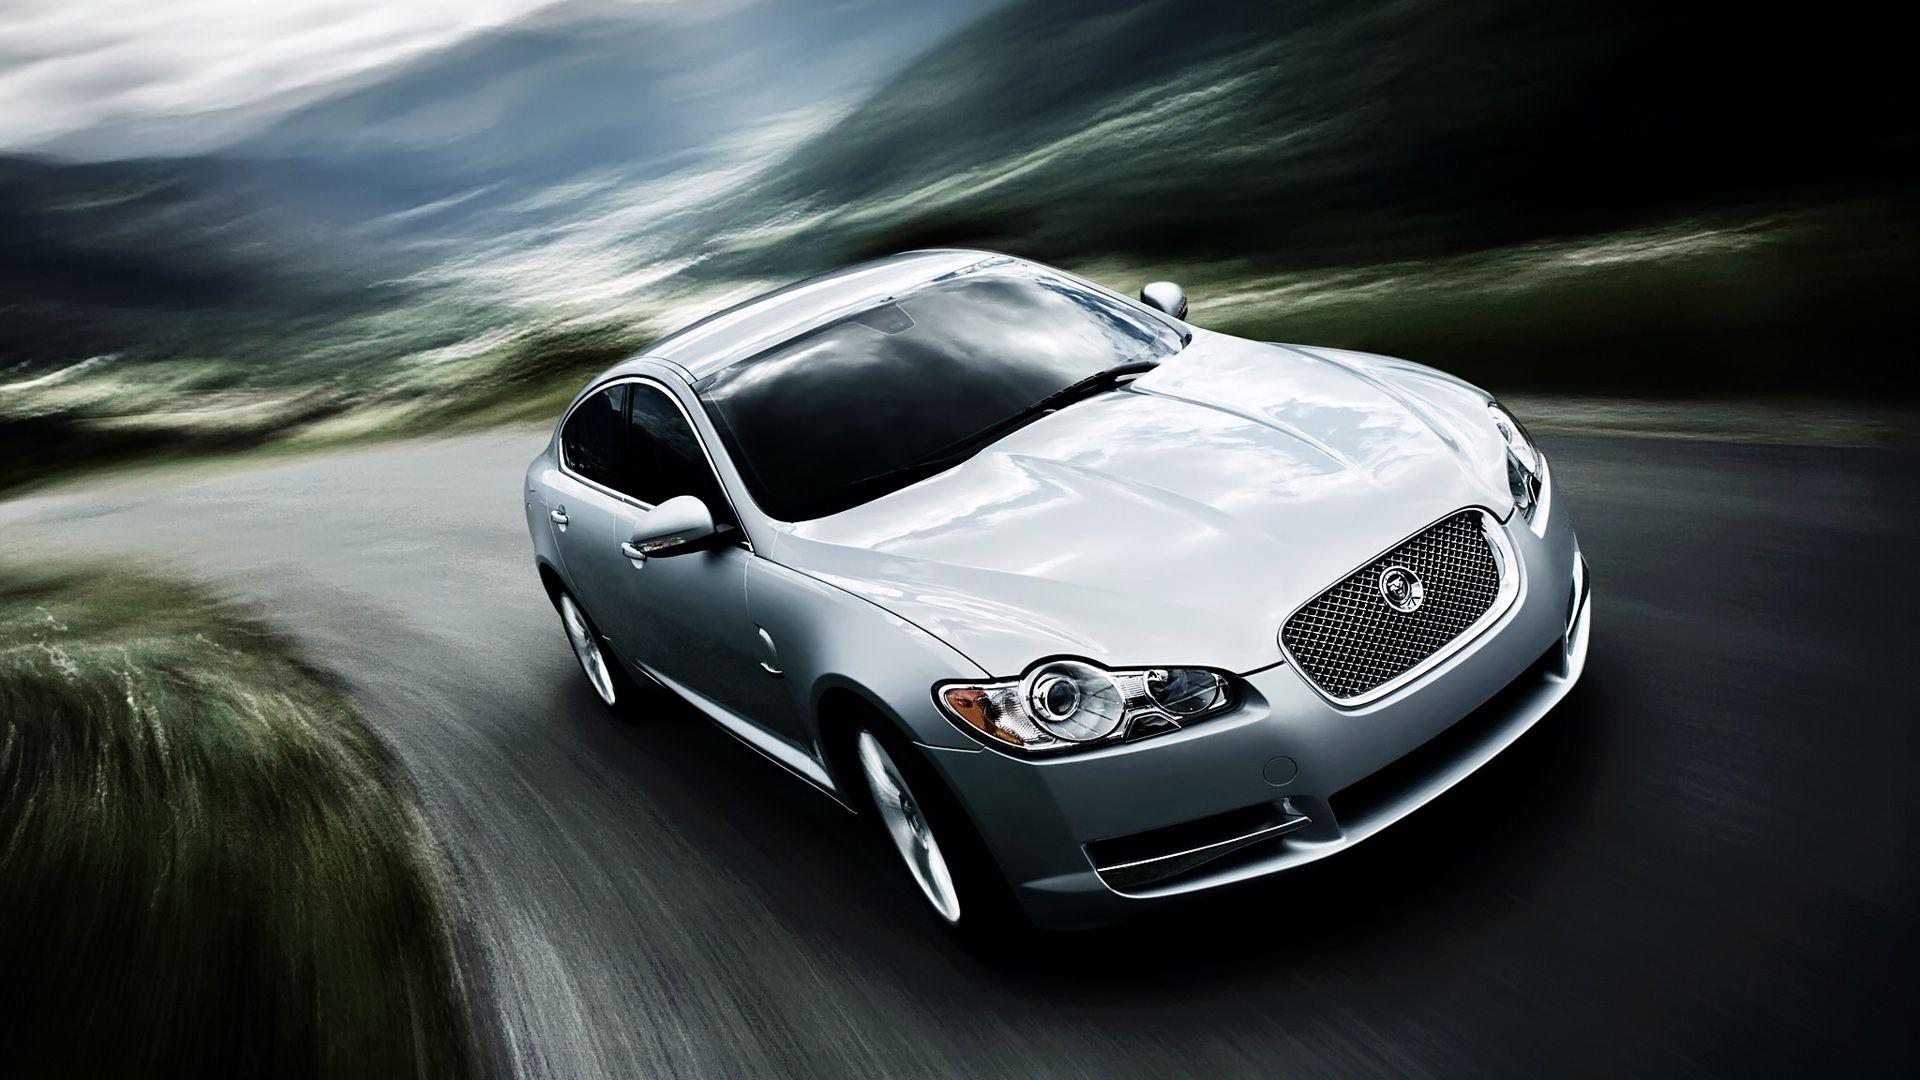 Jaguar Xf Wallpaper Hd